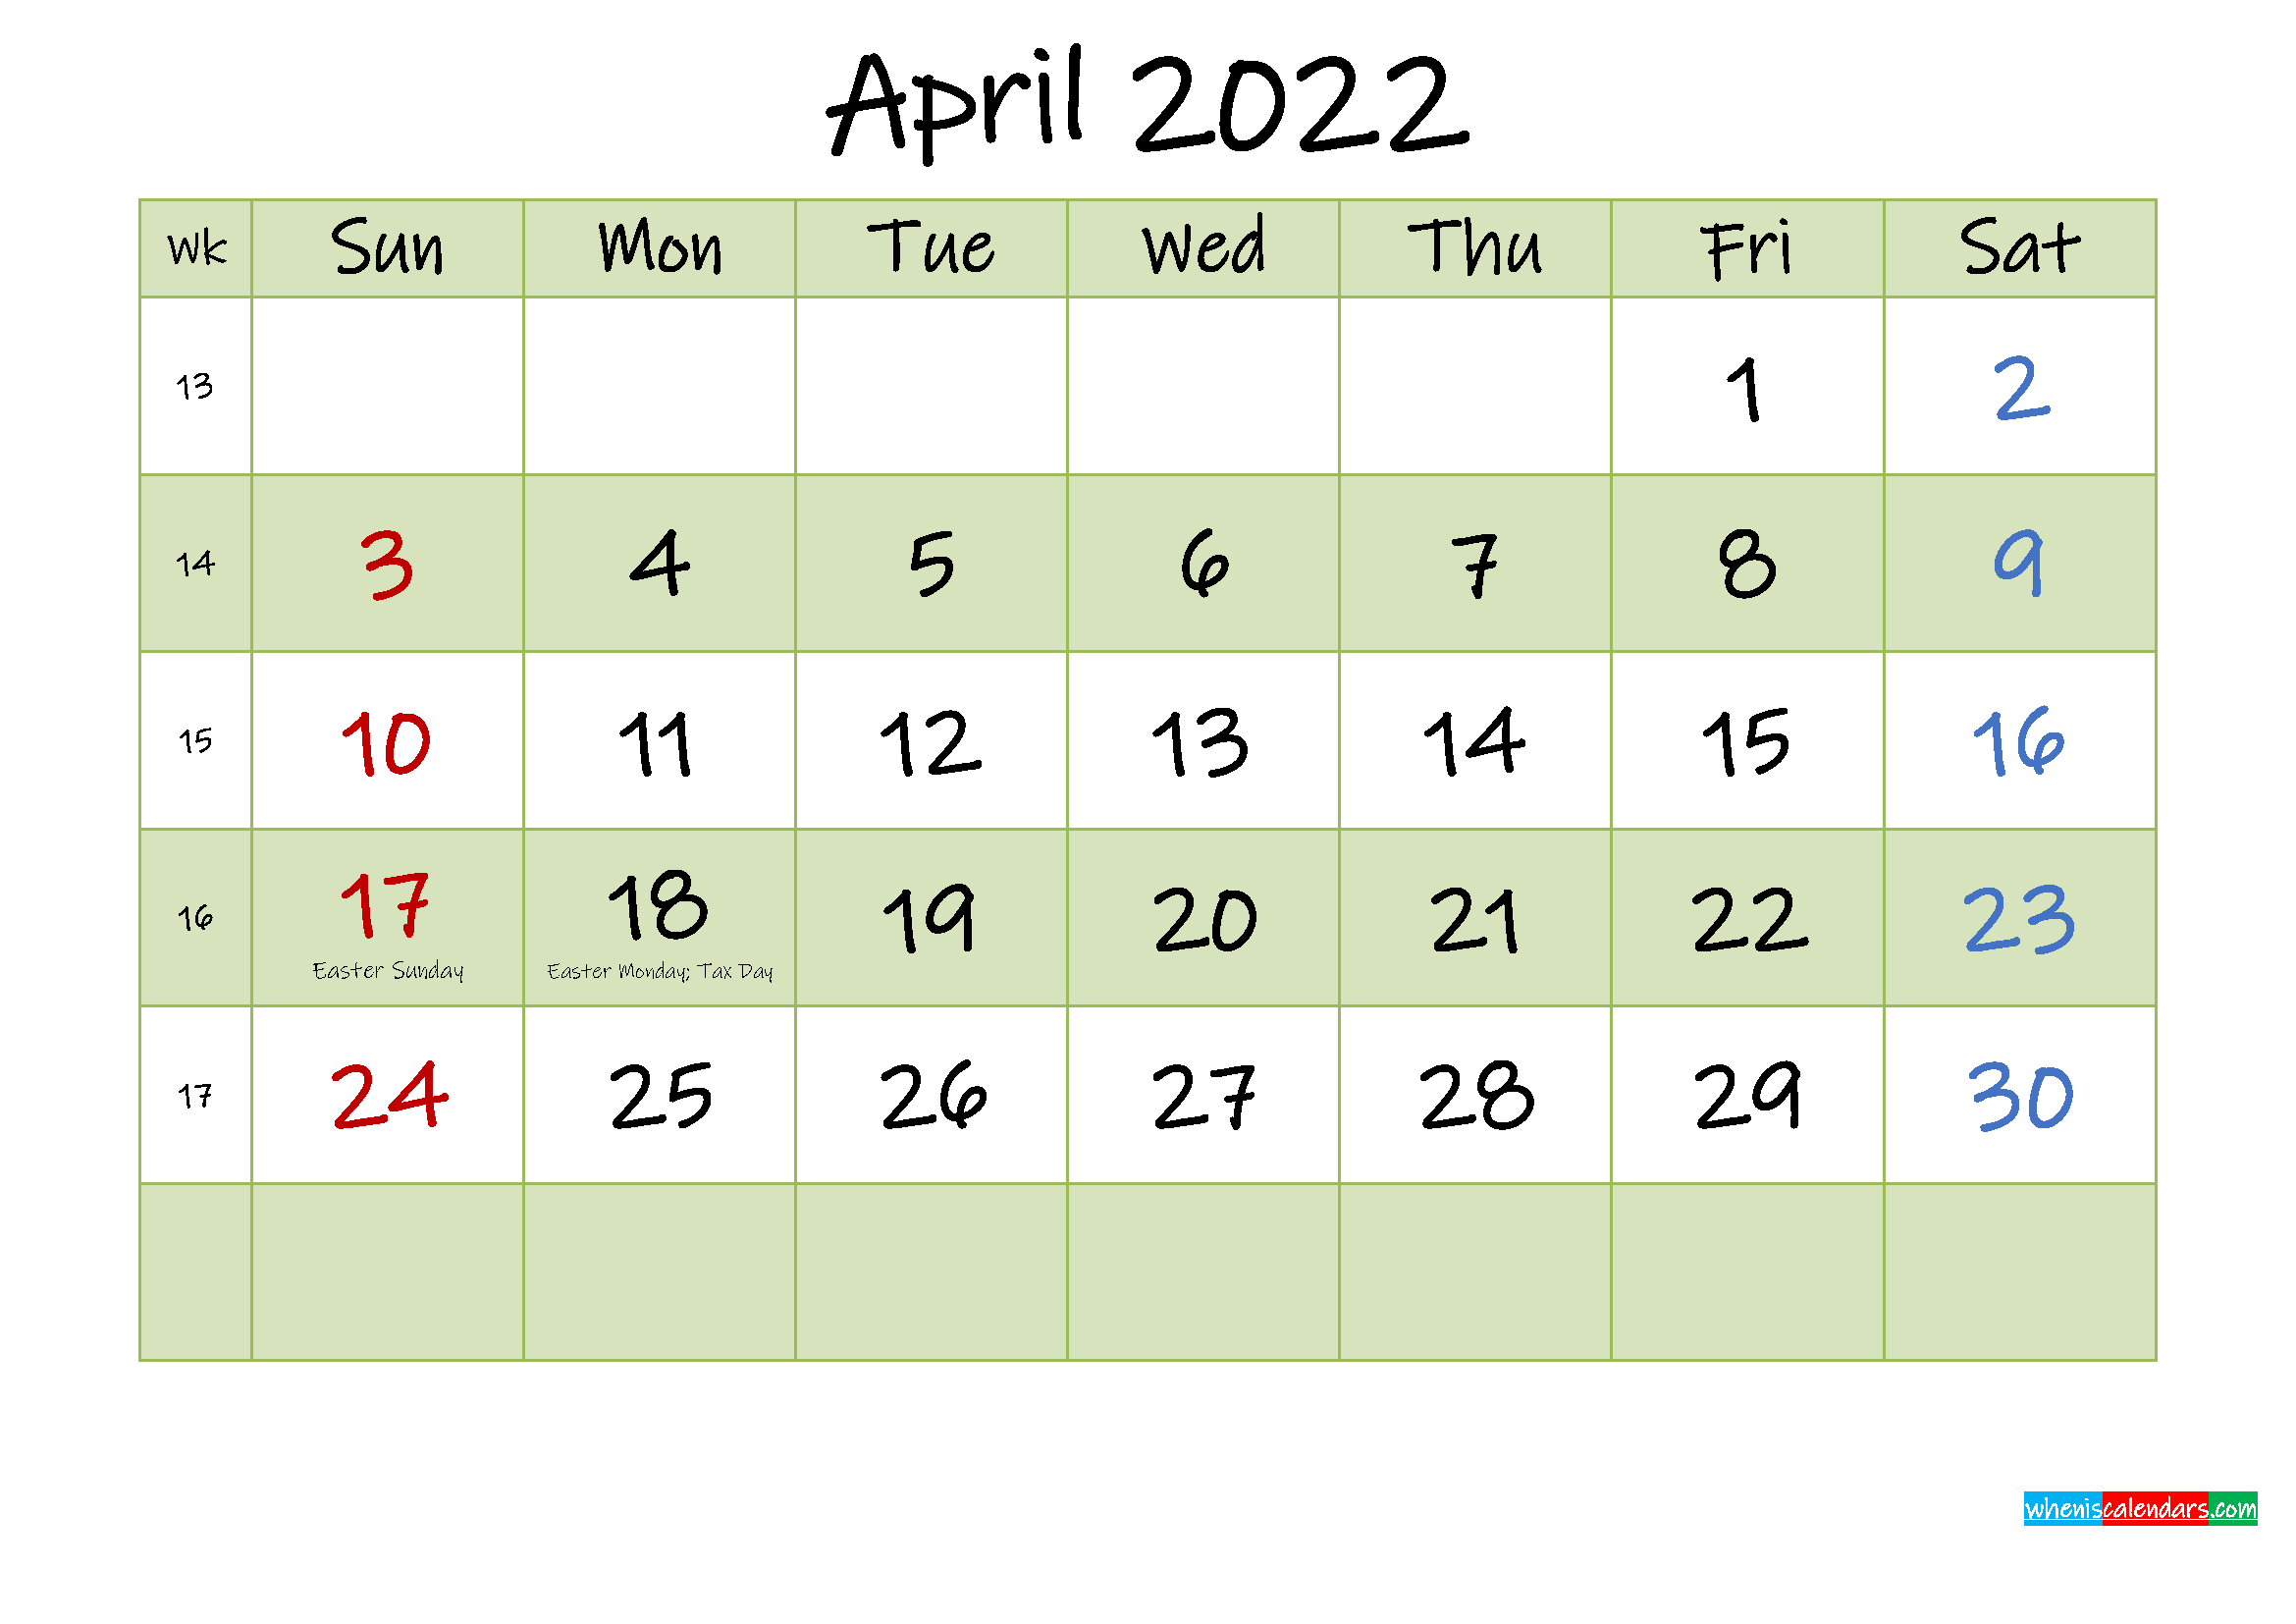 April 2022 Calendar With Holidays Printable - Template No with regard to April Monthly Calendar 2022 Free Printable